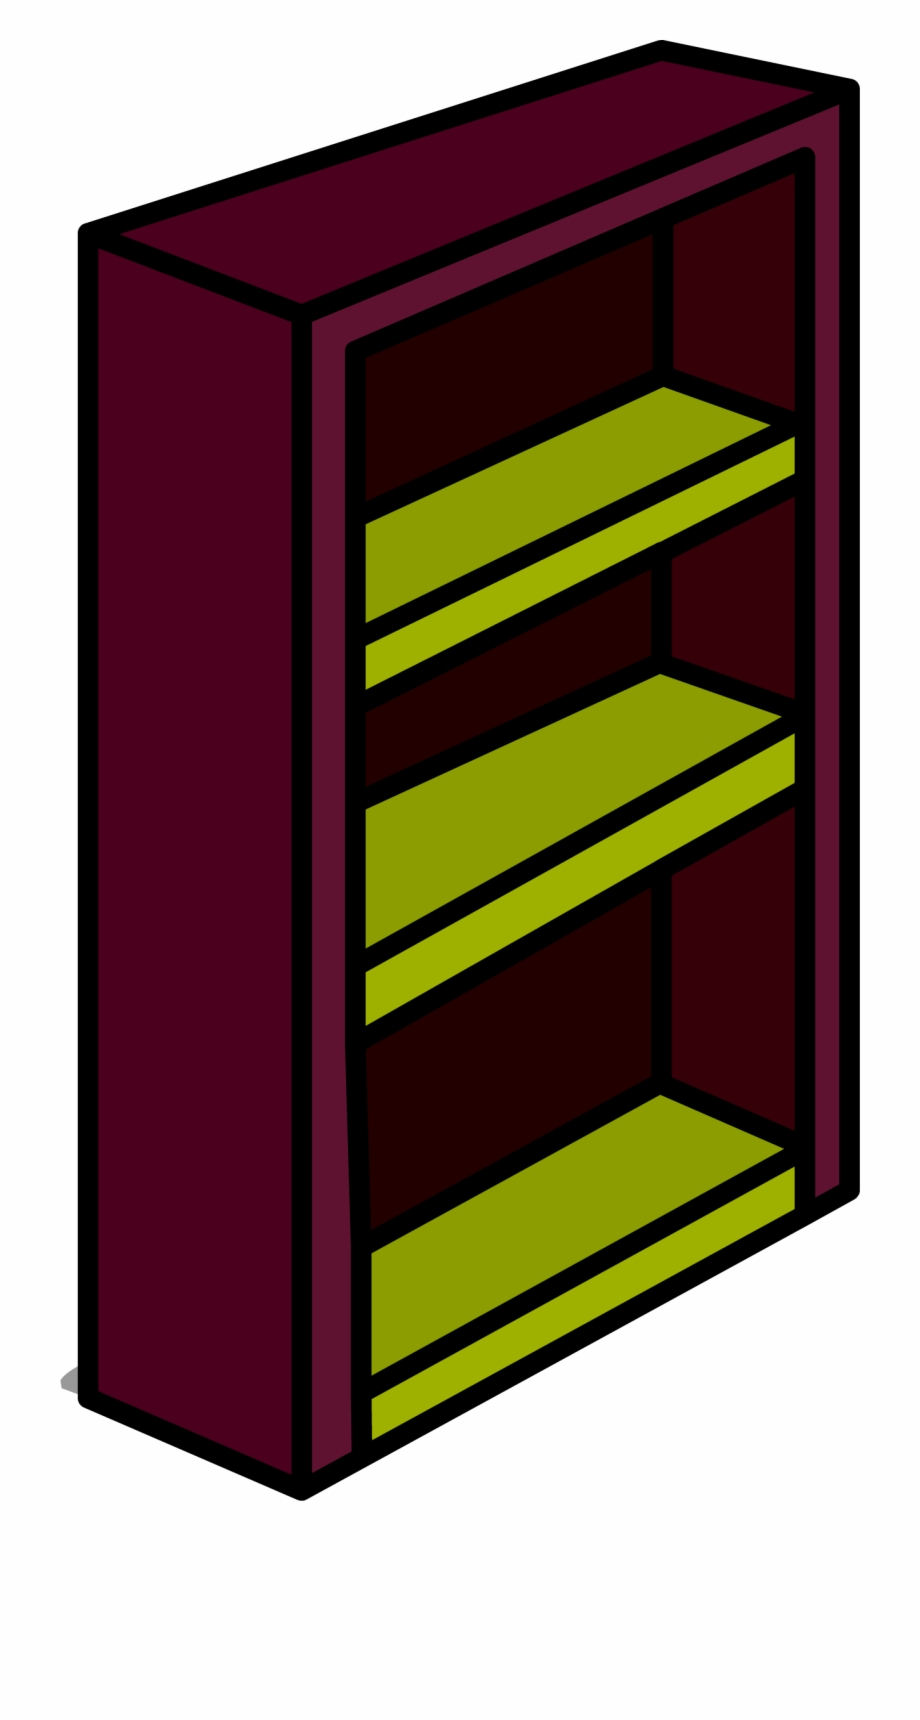 A bookcase clipart svg freeuse Bookshelf Clipart Old Bookshelf - Bookcase Free PNG Images & Clipart ... svg freeuse